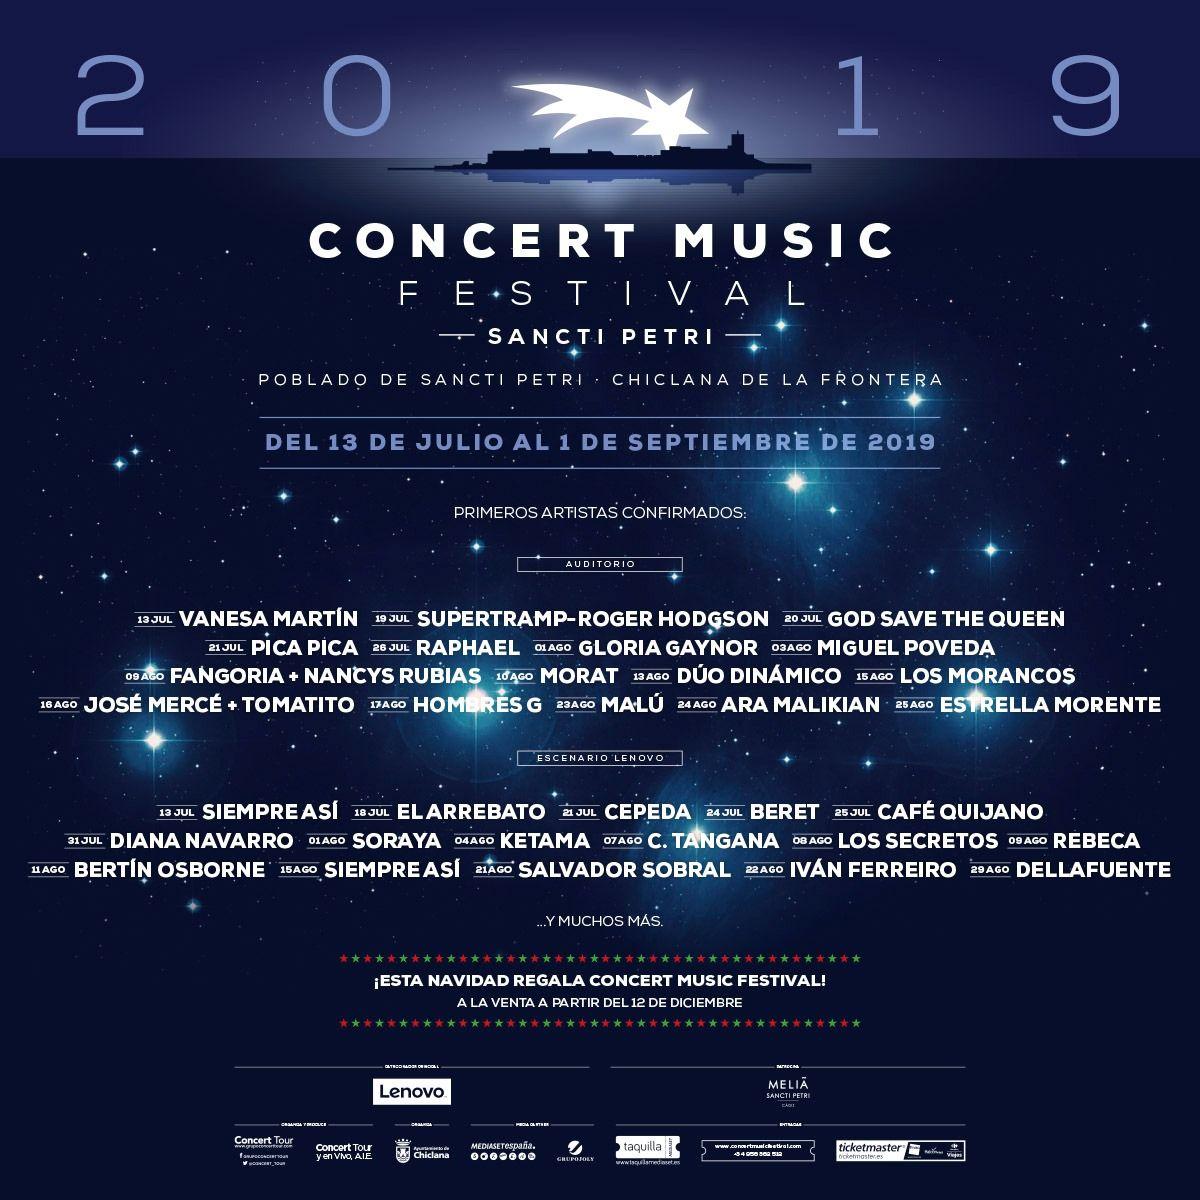 Concert Music Festival Sancti Petri 2019